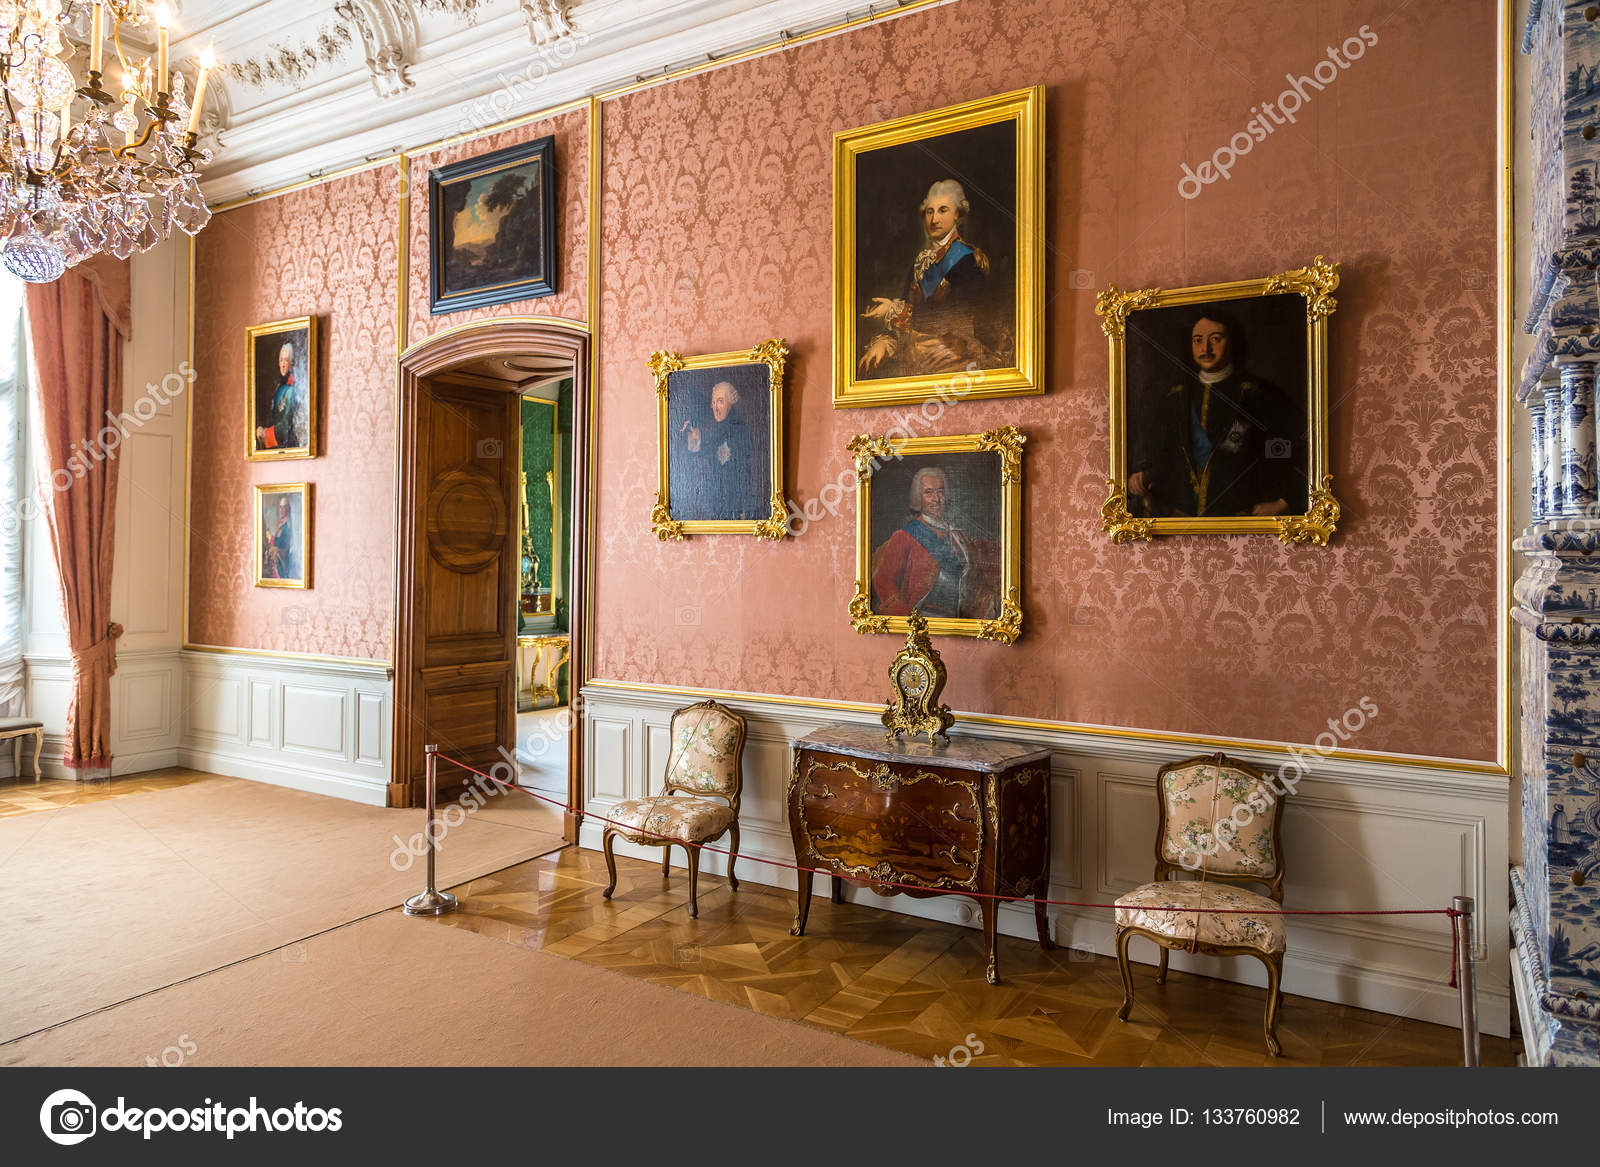 https://st3.depositphotos.com/1000633/13376/i/1600/depositphotos_133760982-stockafbeelding-prachtige-antieke-interieur.jpg